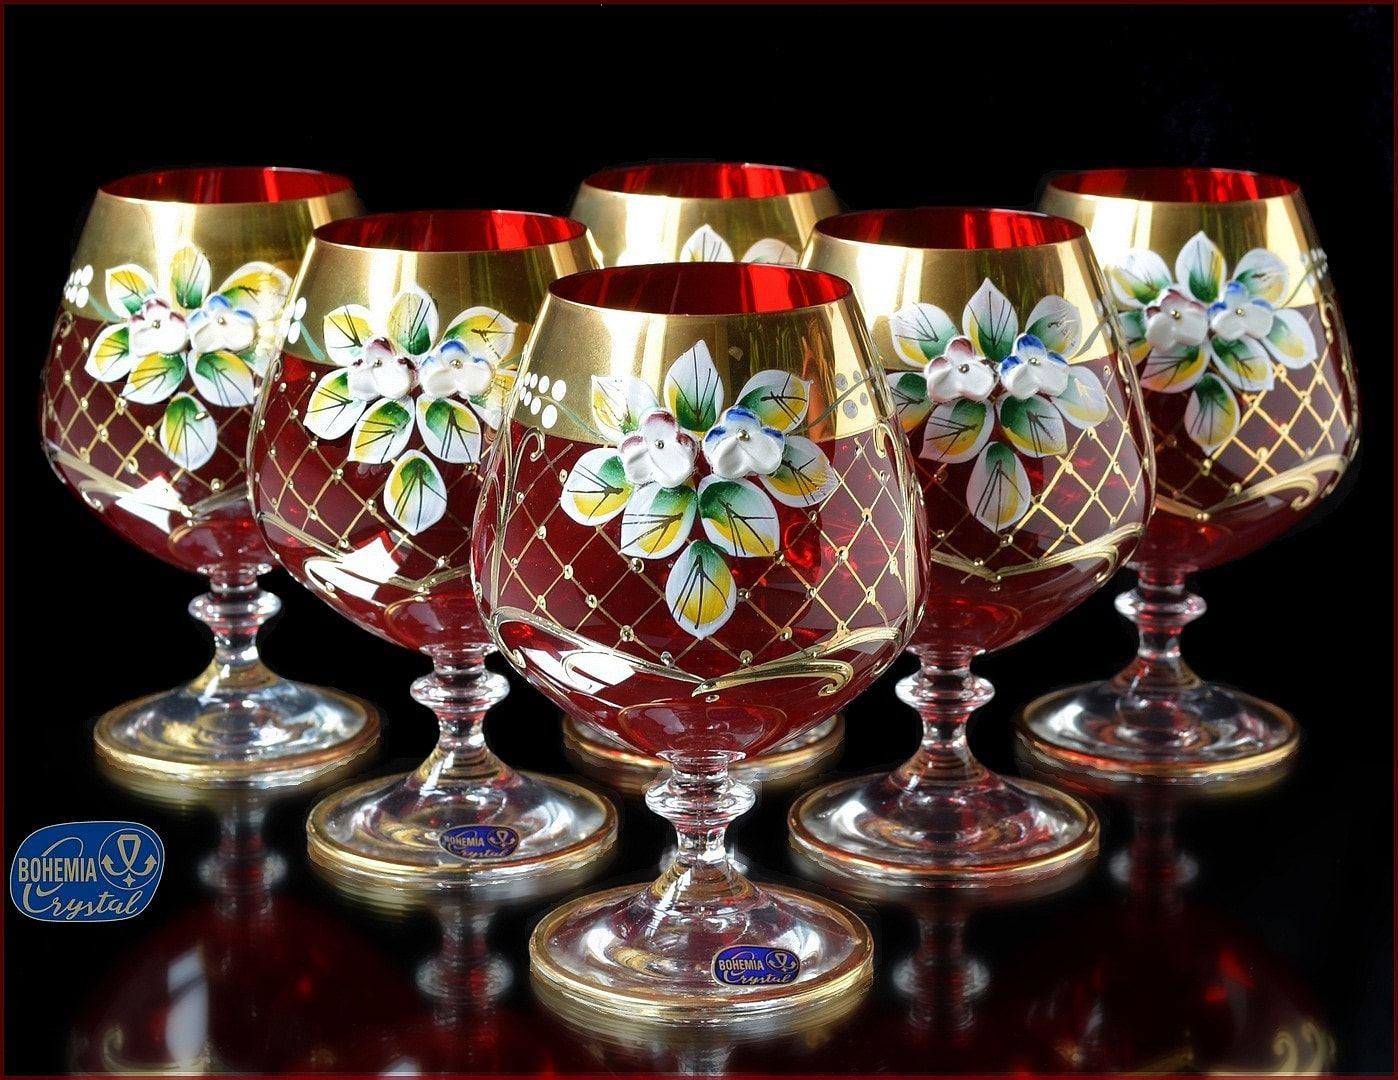 Bohemian Crystal And Czech Glass Bohemia Crystal Bohemian Glass Crystal Glassware